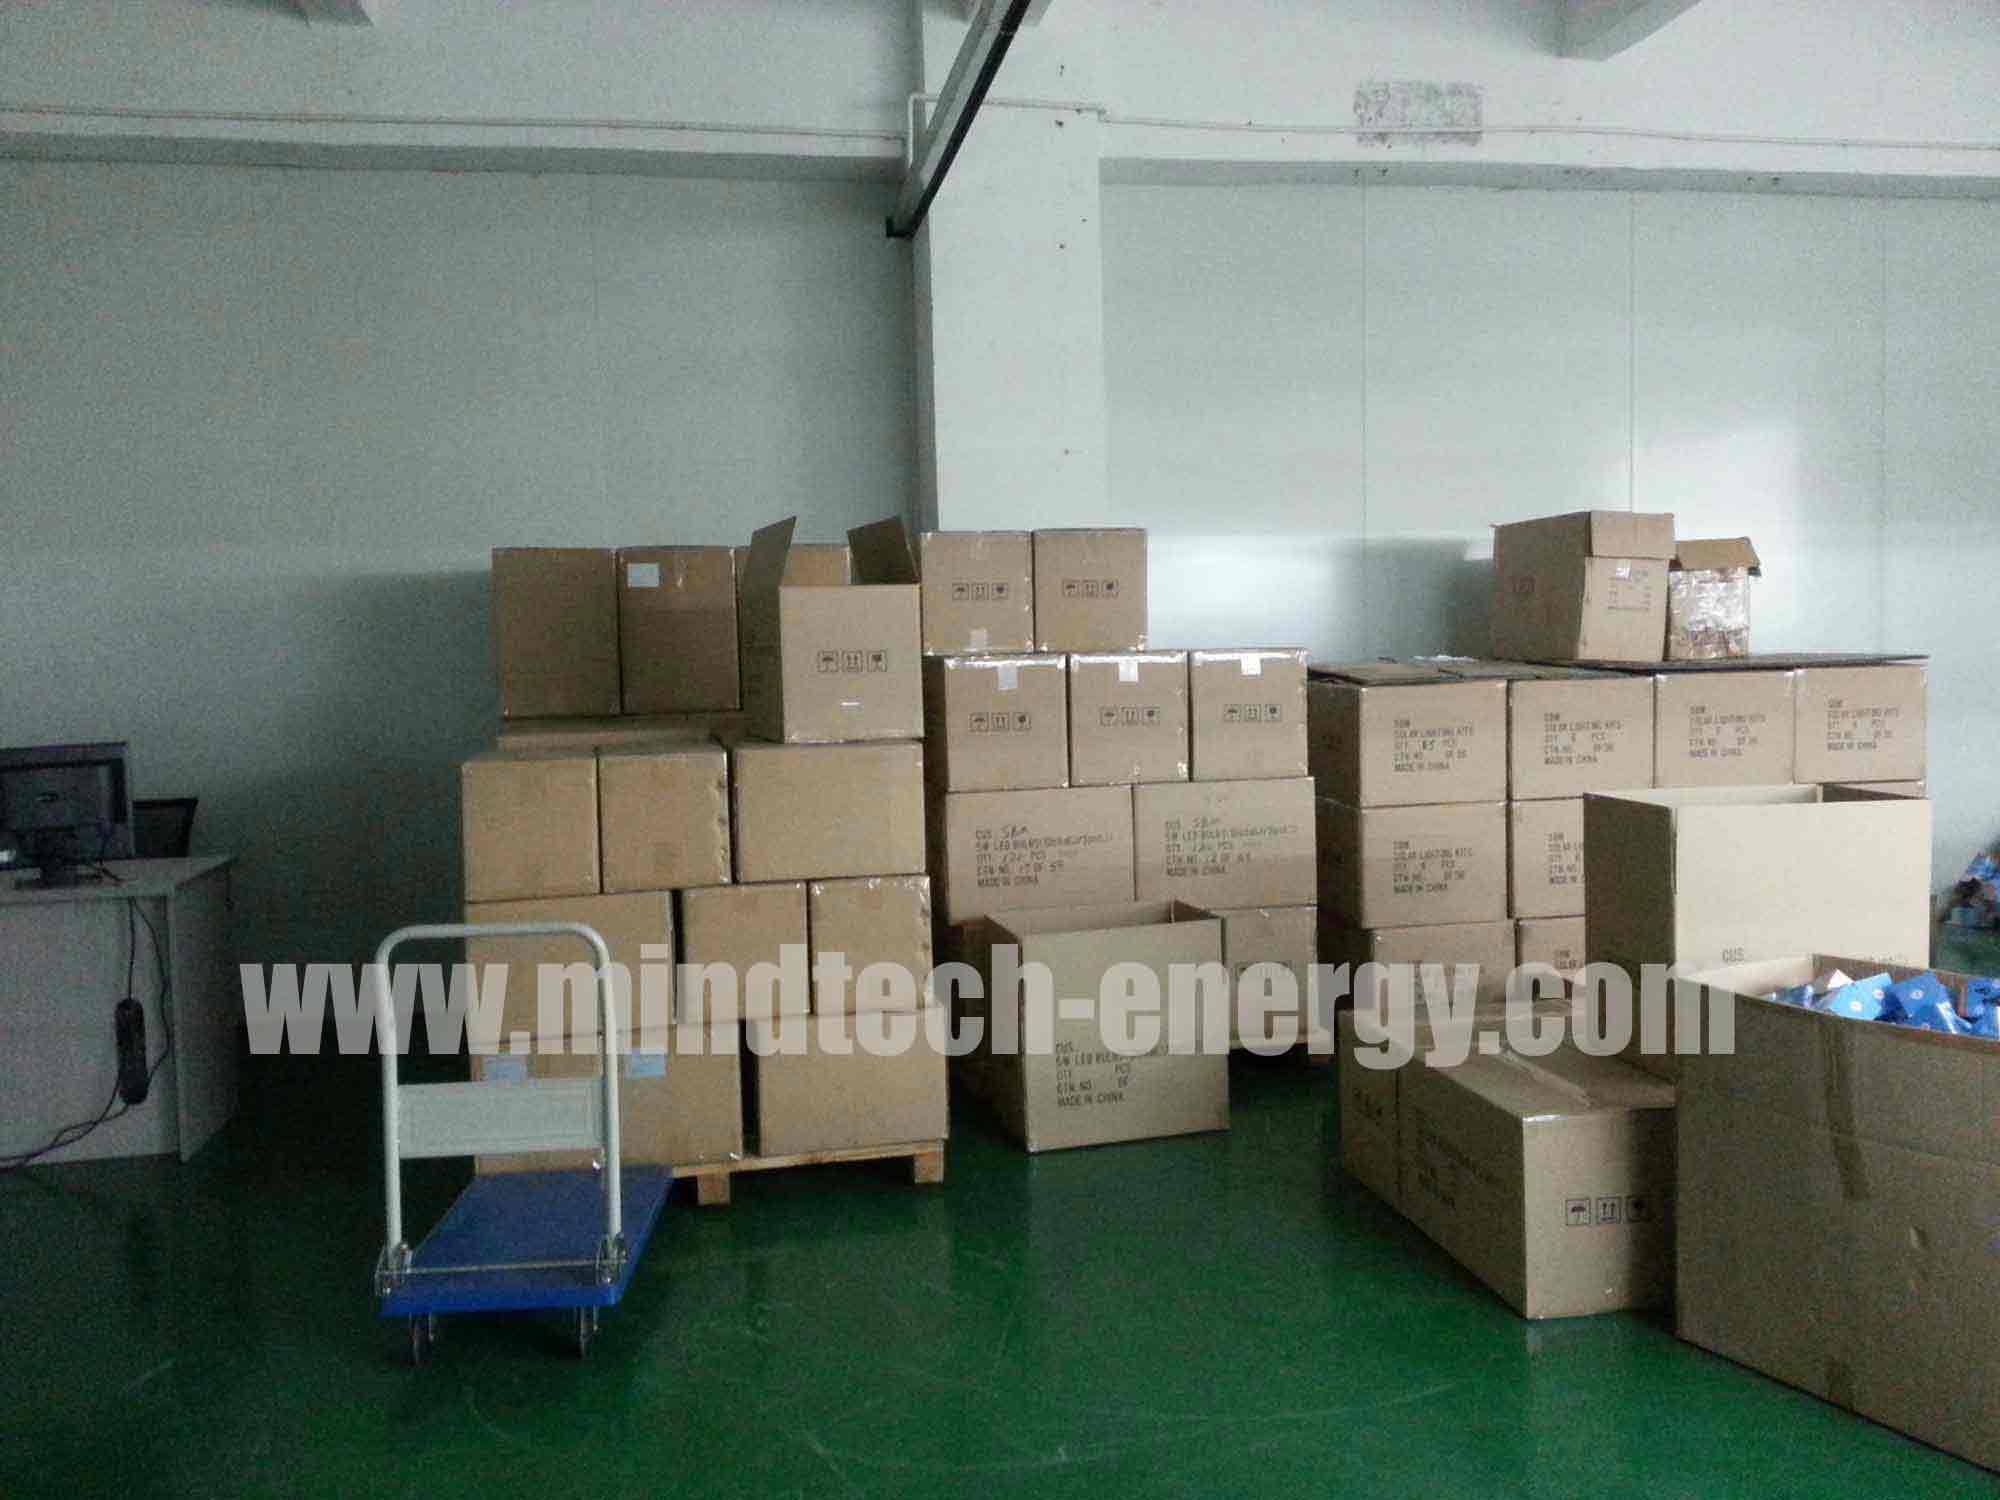 10w home light kit panneau solaire buy kit panneau solaire home light kit p - Panneau solaire mobil home ...